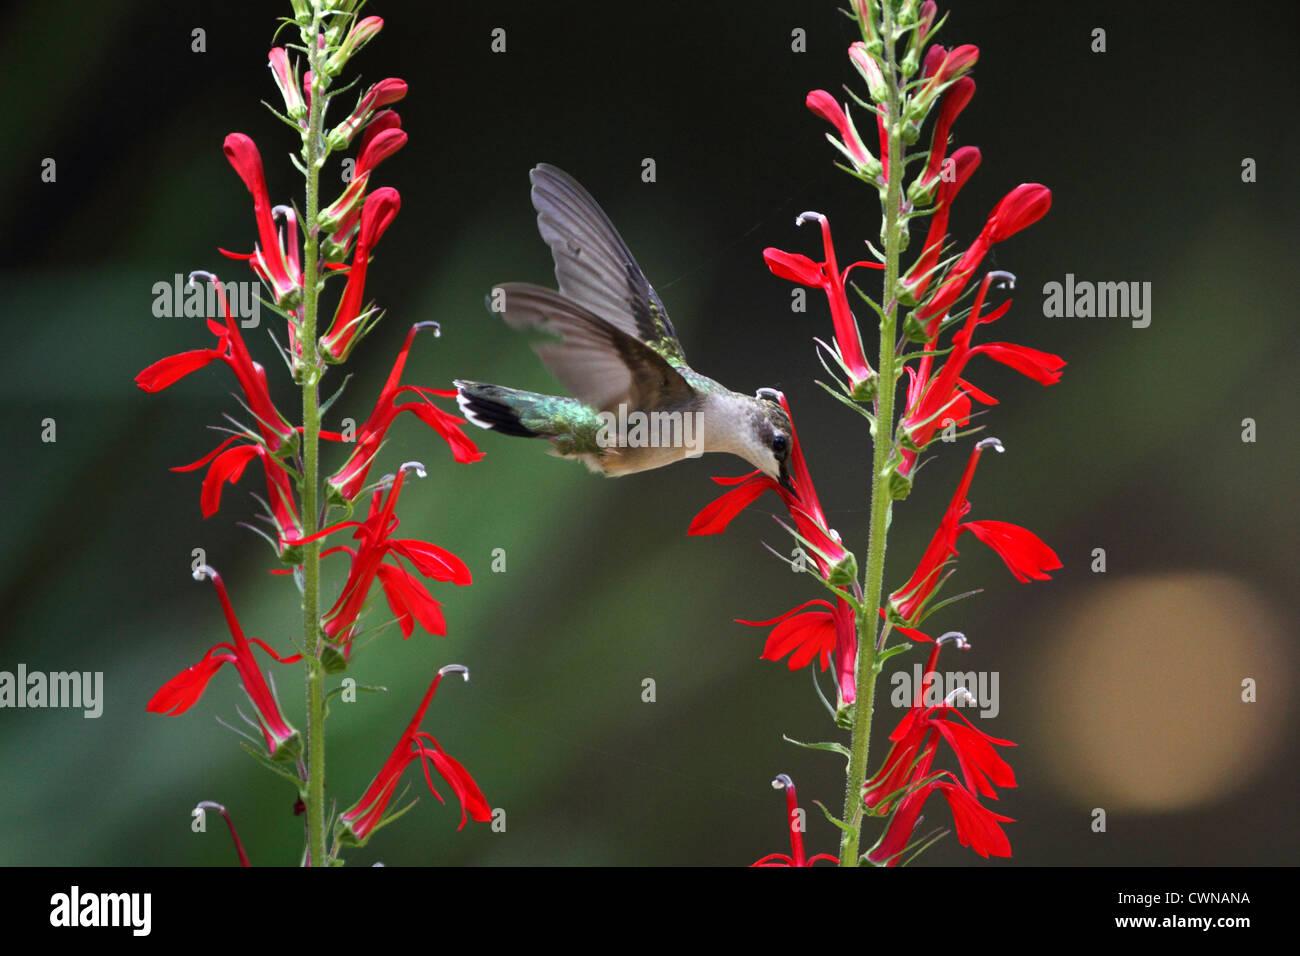 A Ruby-throated Hummingbird, Archilochus colubris flying to a Cardinal flower, Lobelia cardinalis. Female or immature Stock Photo